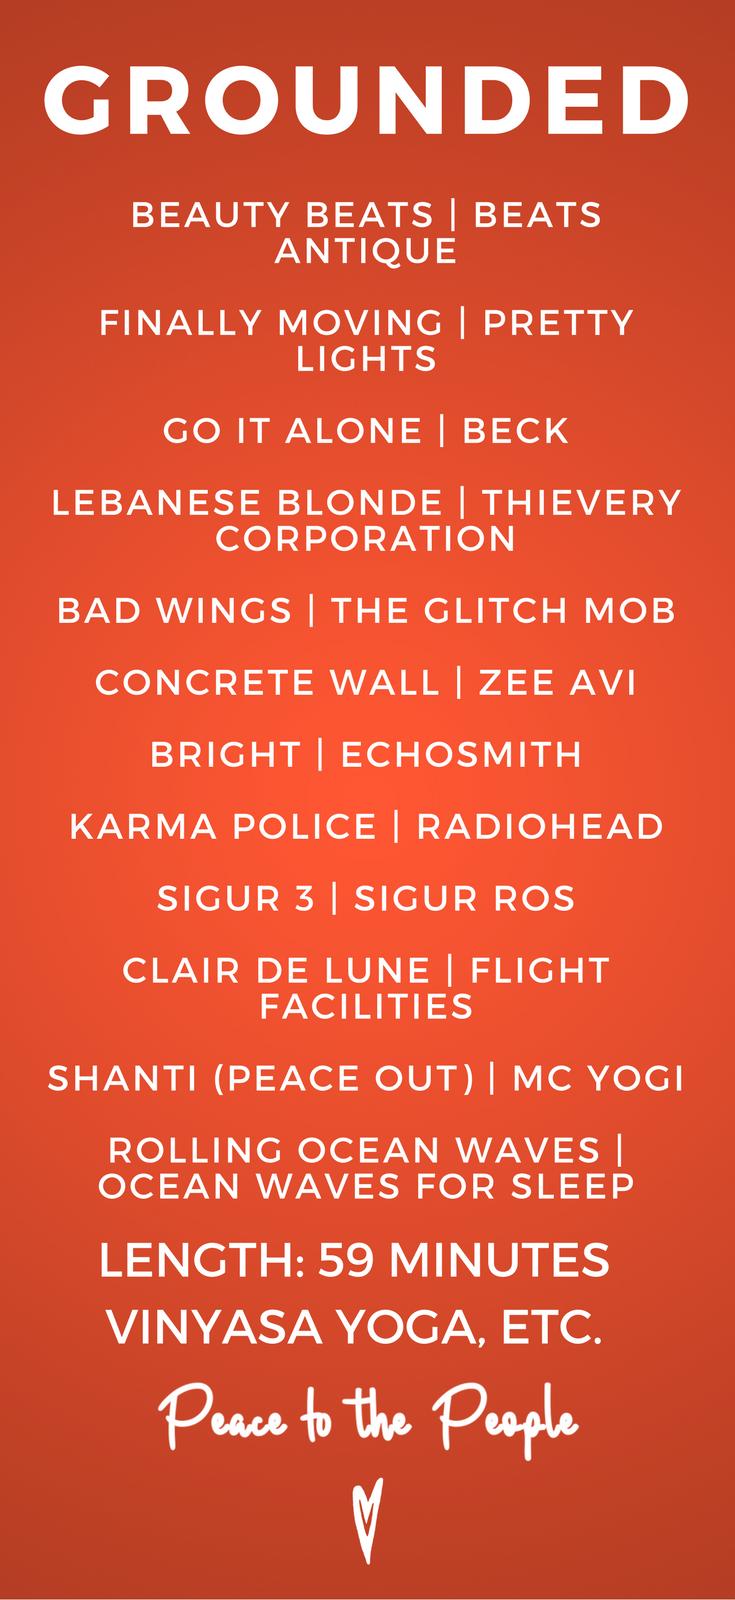 Grounding Vinyasa Yoga Playlist Peace to the People Fitness Playlist